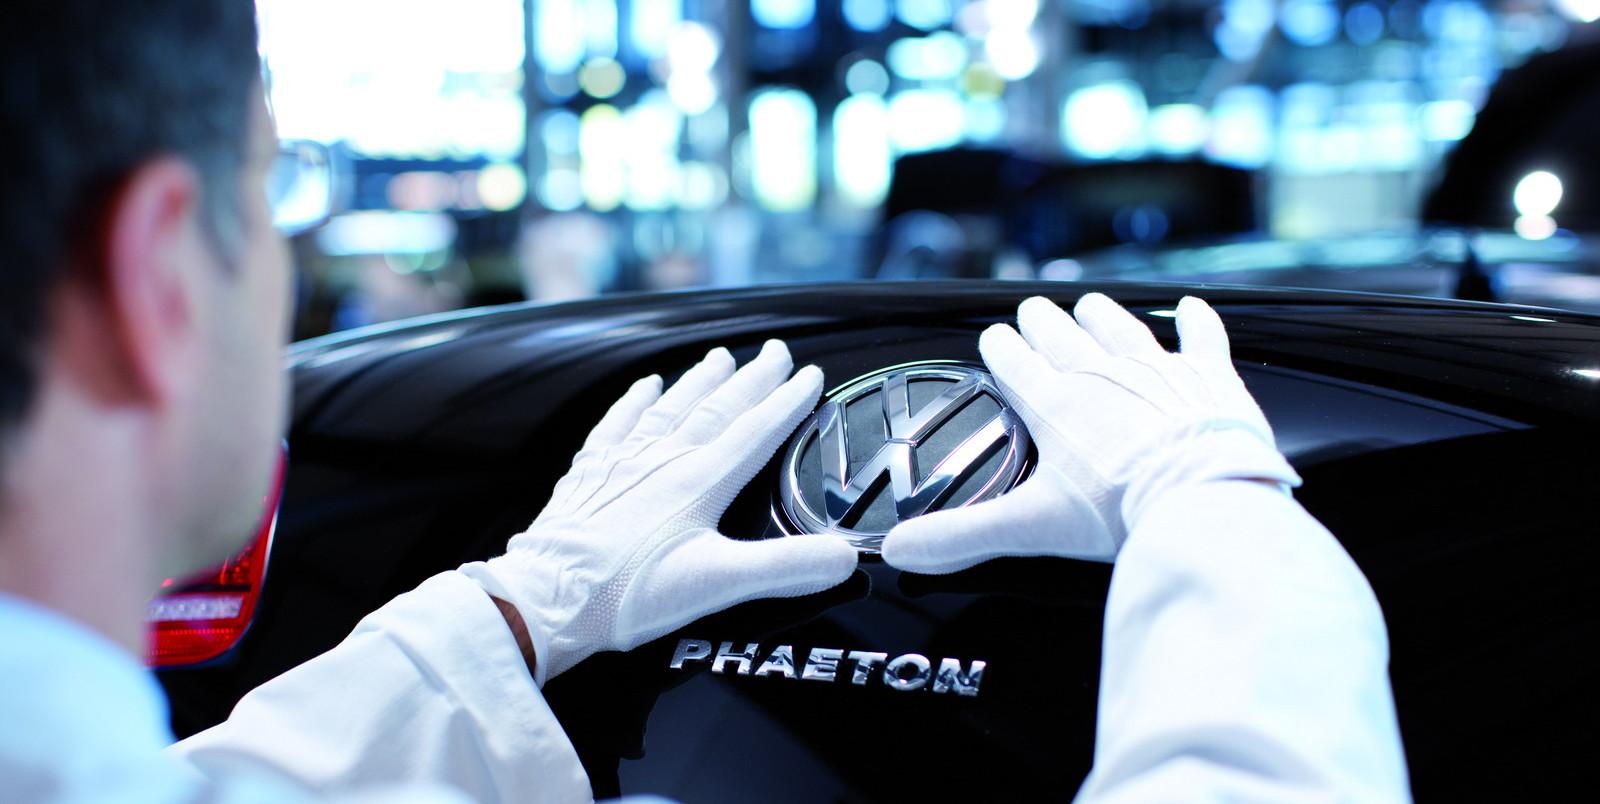 С конвейера сошел последний Volkswagen Phaeton 1